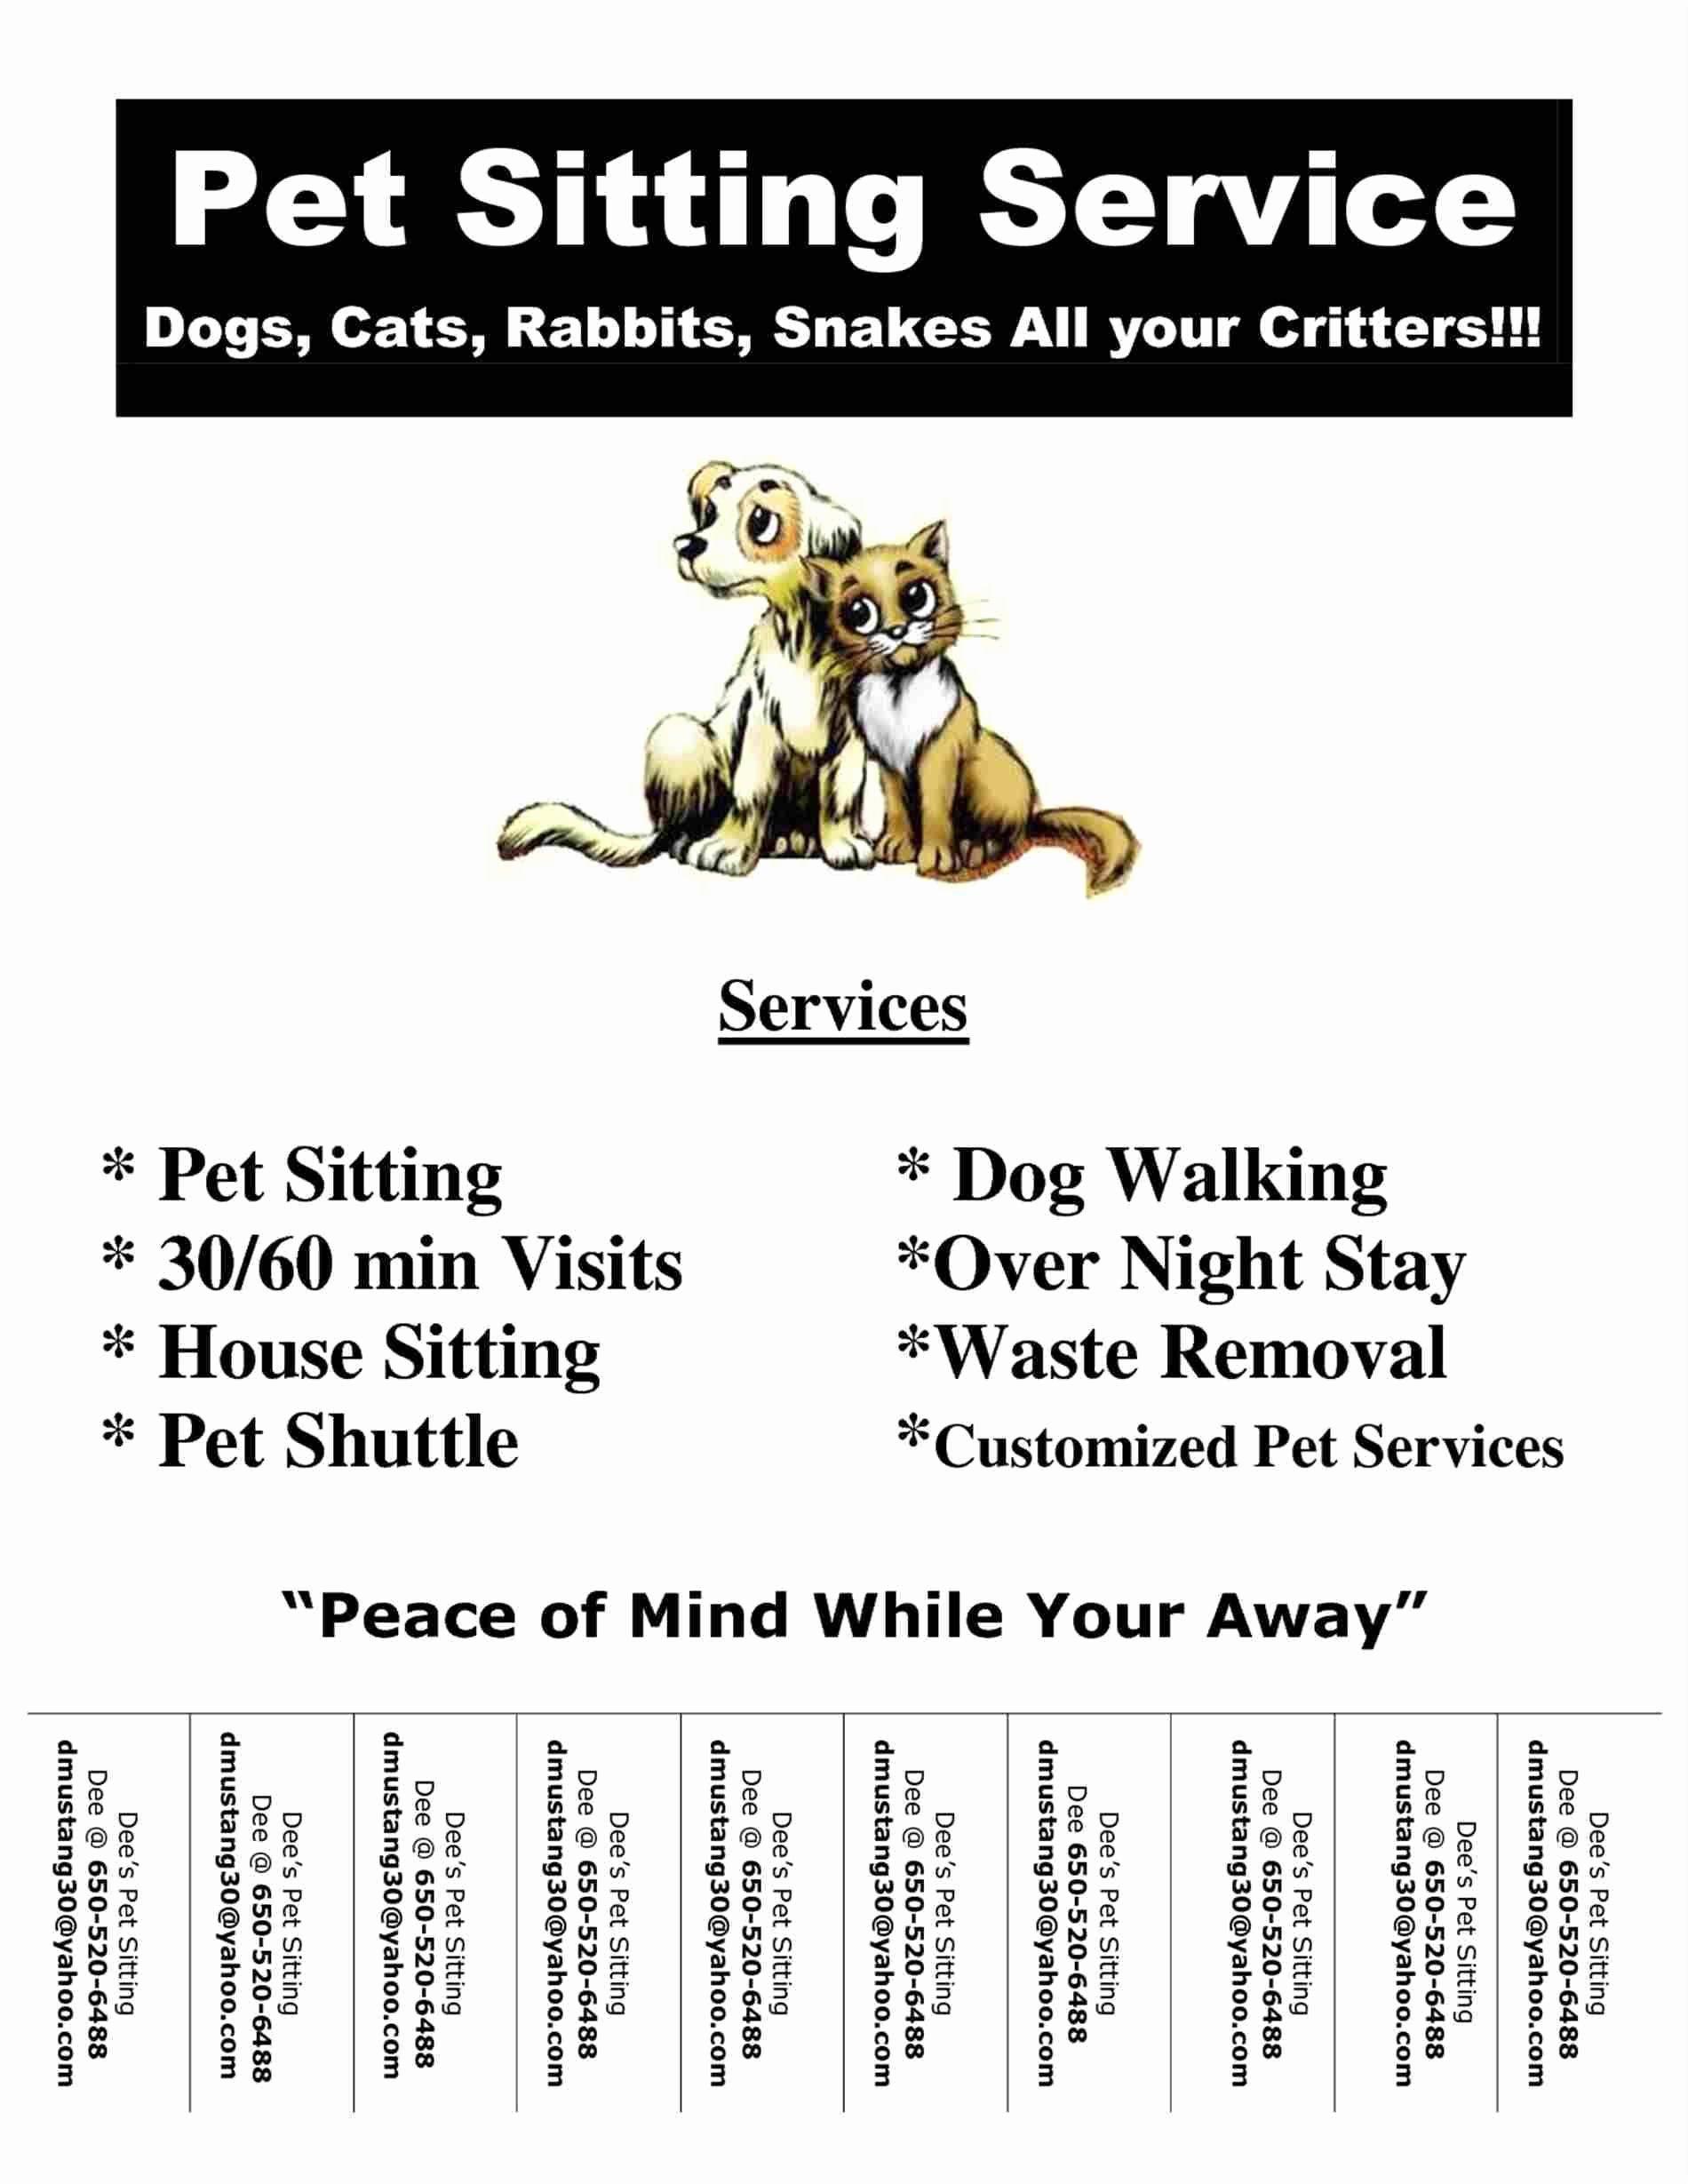 Dog Walking Flyer Template Awesome Dog Walking Excel Spreadsheet Google Spreadshee Dog Walking Excel Spreadsheet